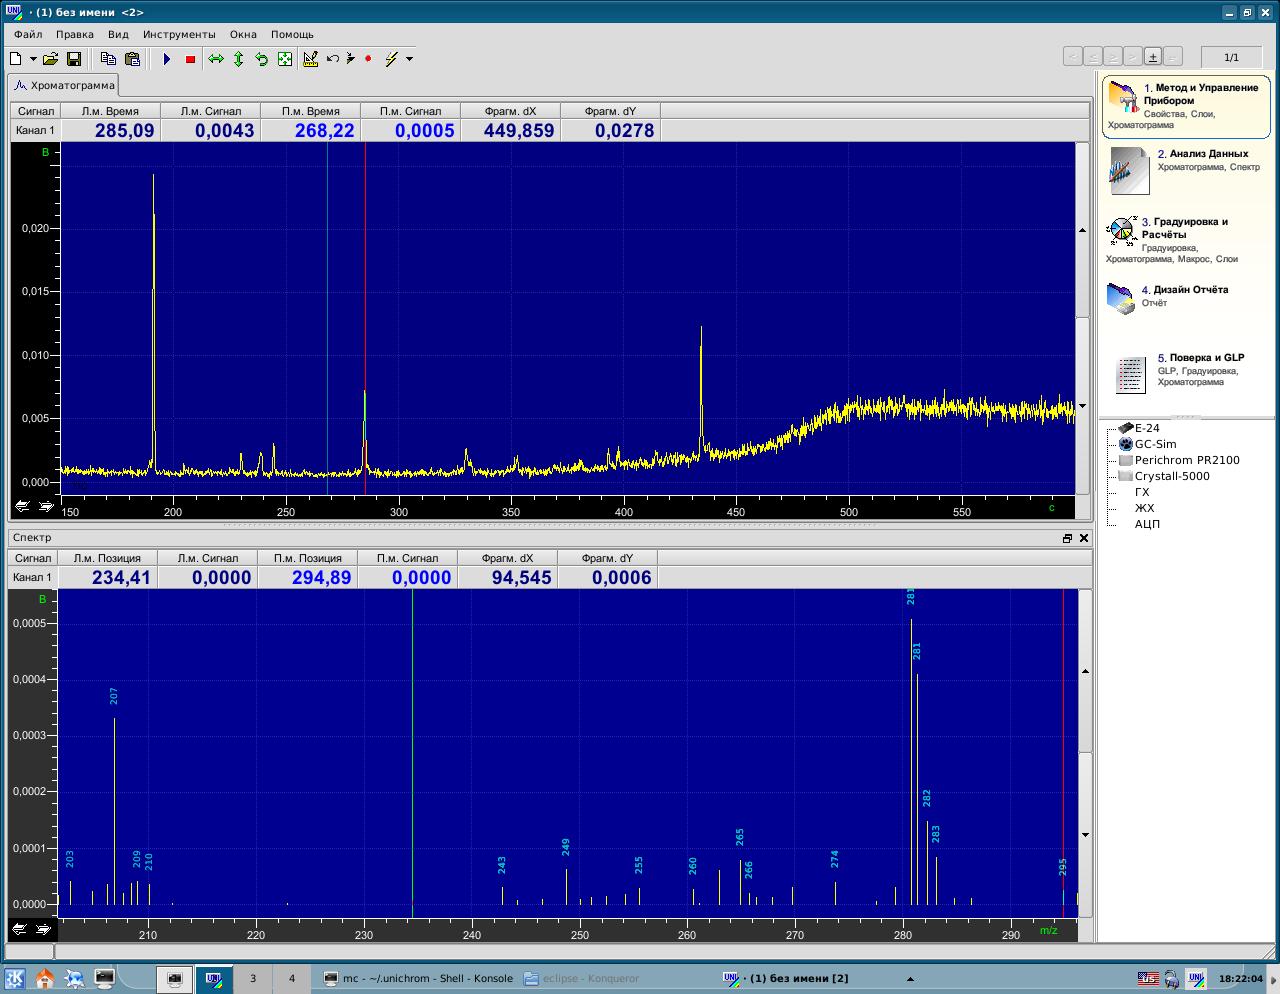 UniChrom - The Linux Chromatography Data System